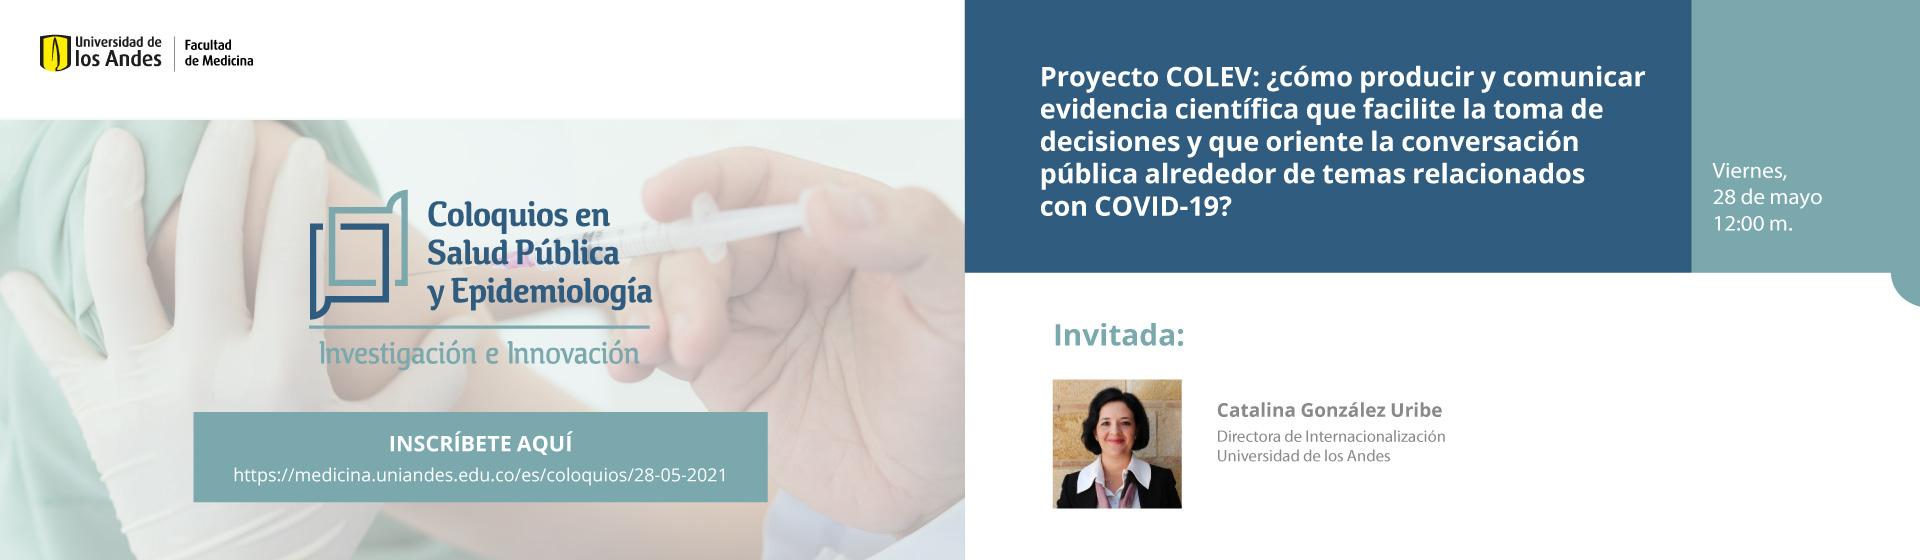 Proyecto COLEV